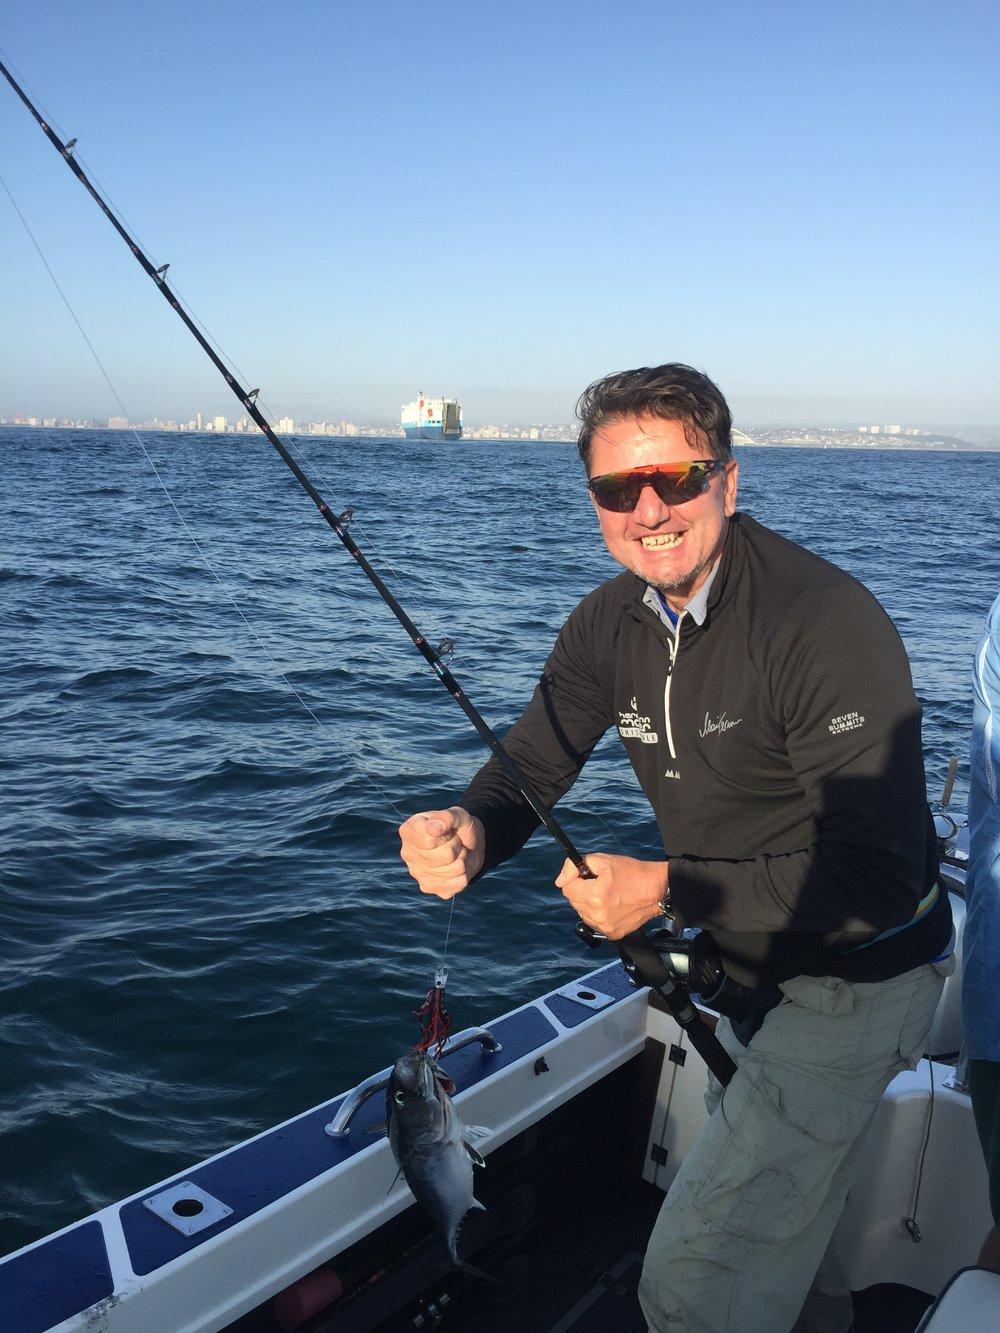 Deep Sea Fishing, Durban, South Africa - October 2018